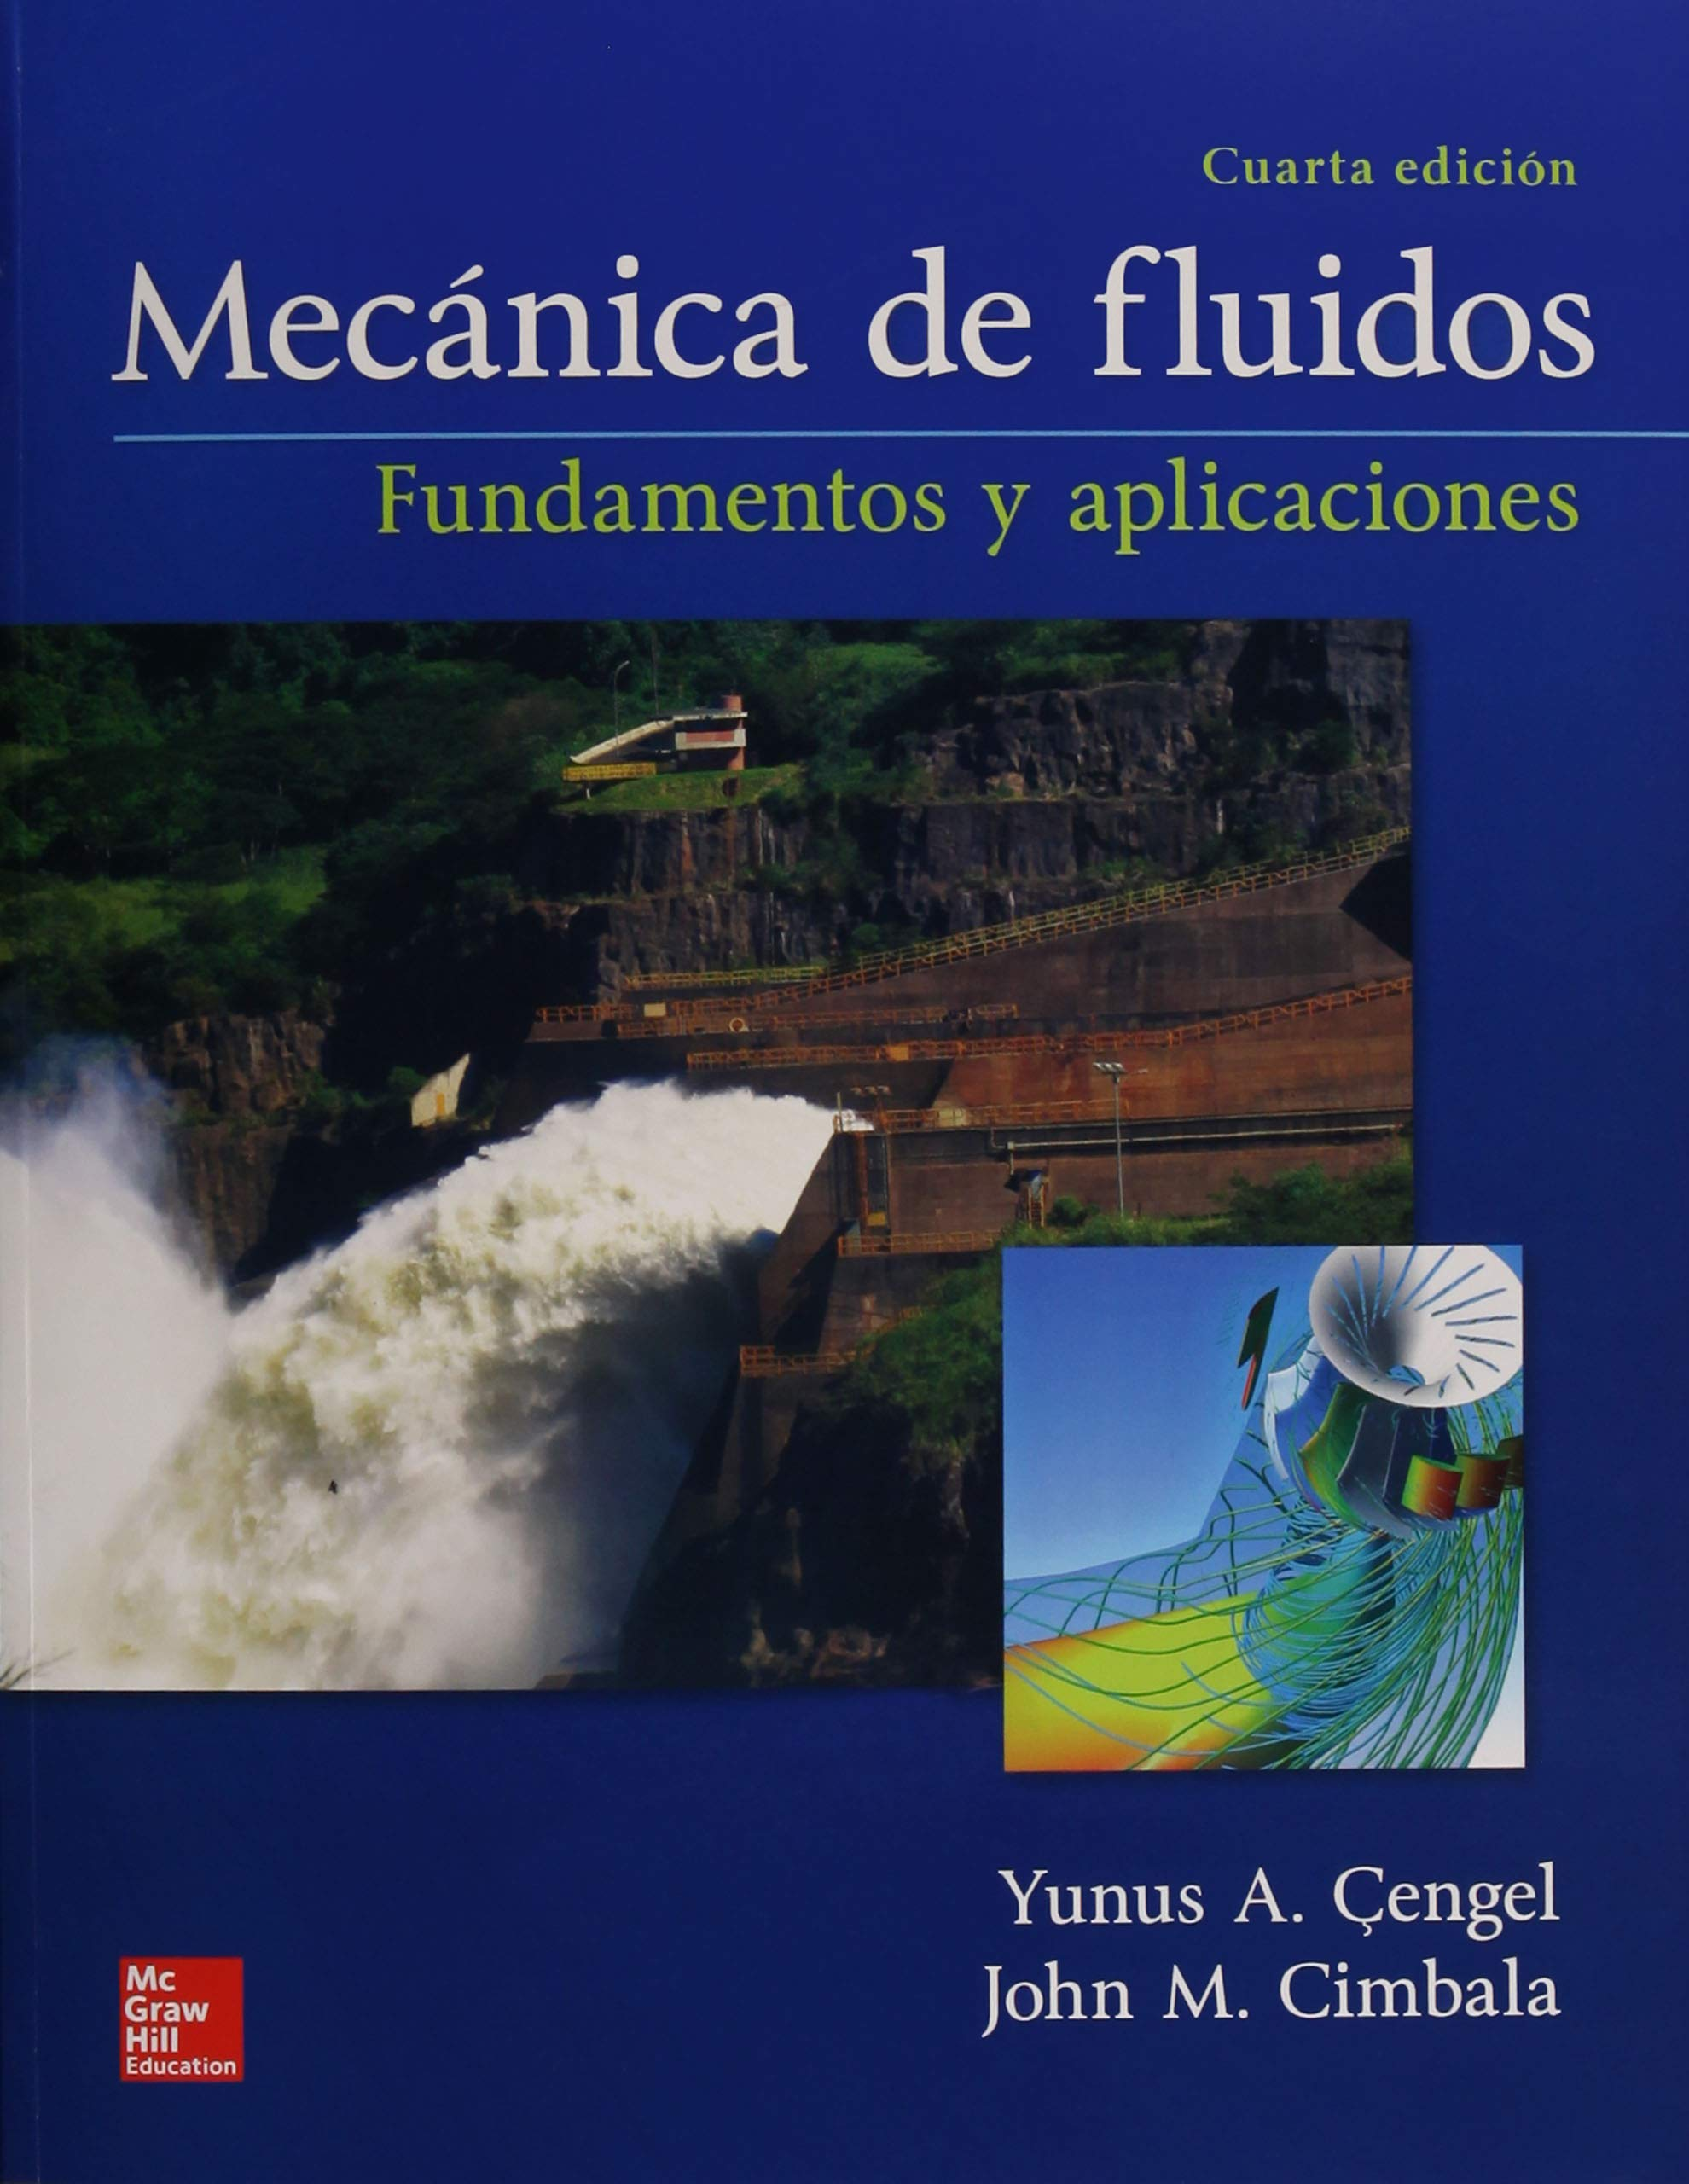 Mecanica De Fluidos Cengel Yunus 9781456260941 Books